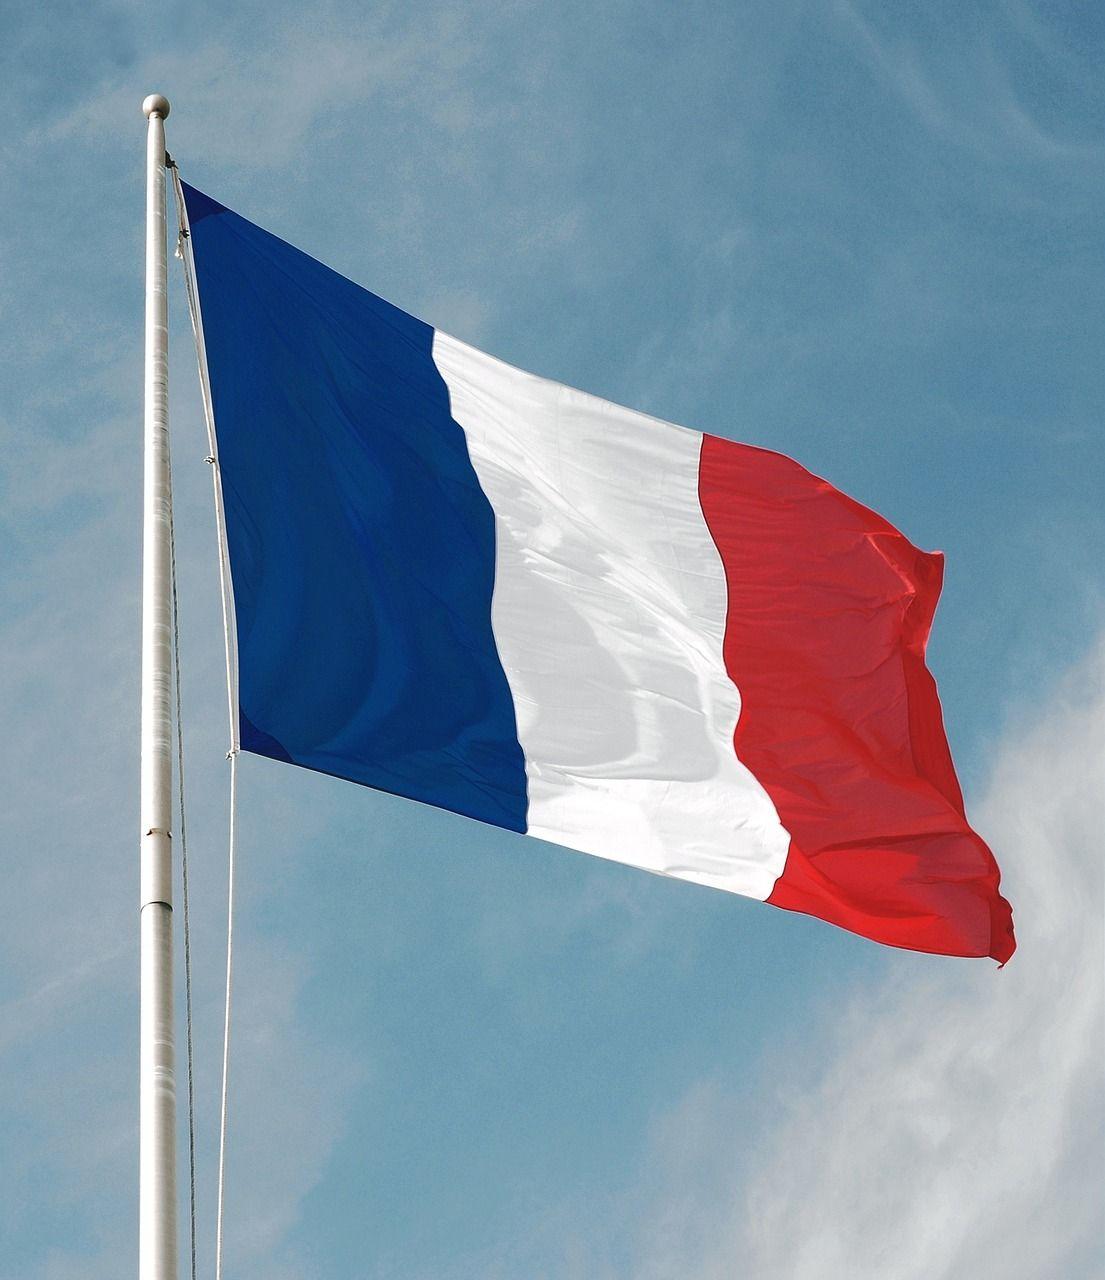 France French Flag France Flag Nation French Flag France French Flag France Flag Nation French Flag France Flag French Flag Flag